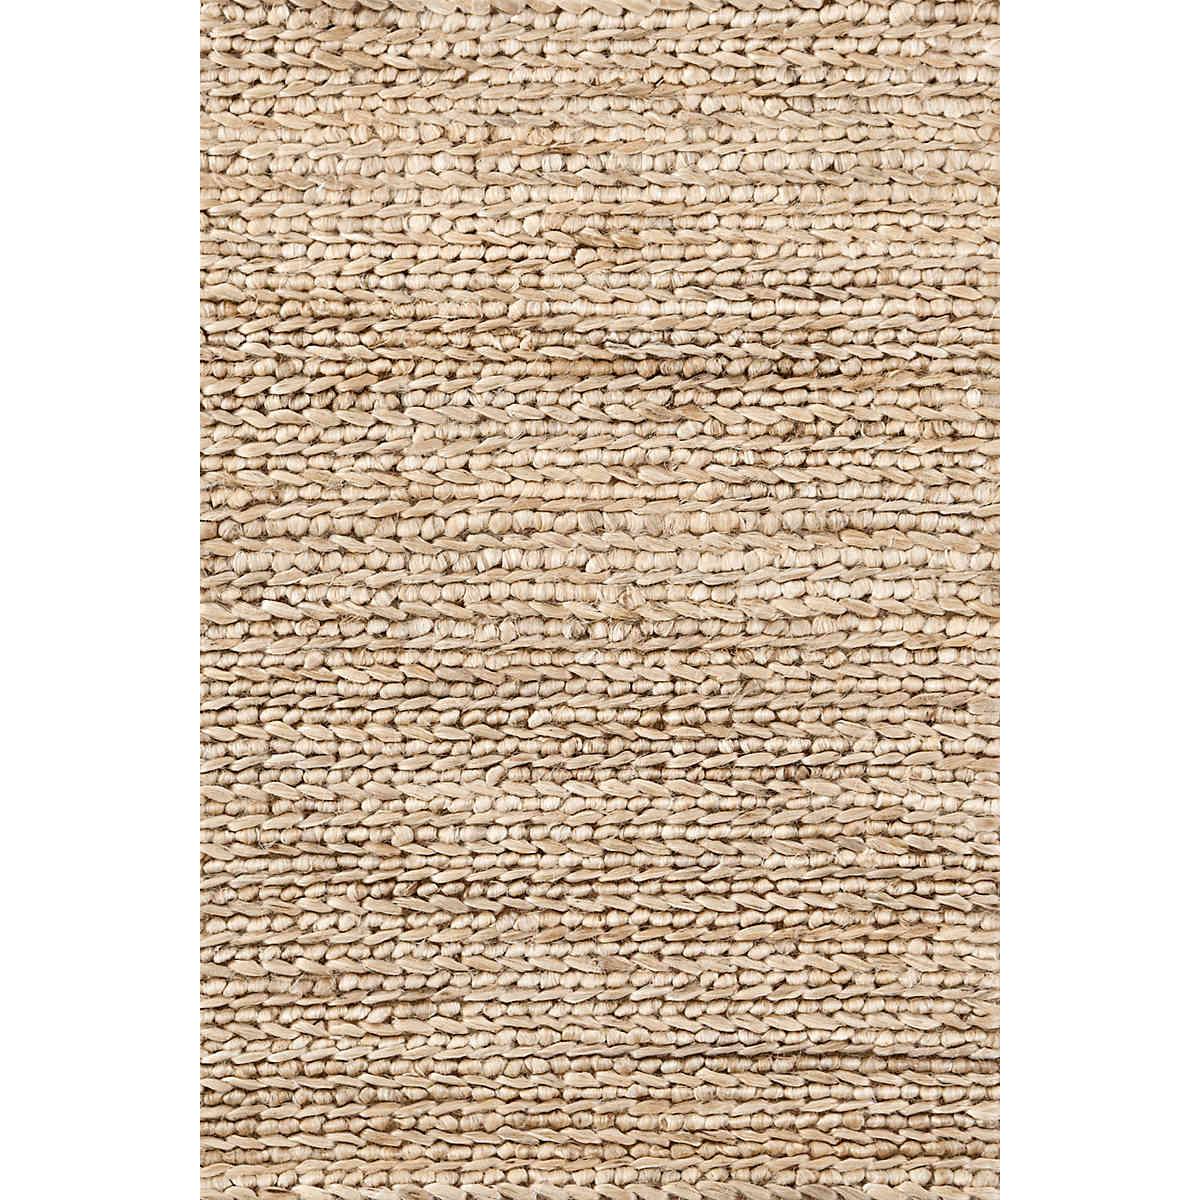 woven rugs jute woven natural rug | dash u0026 albert UWQKPNK